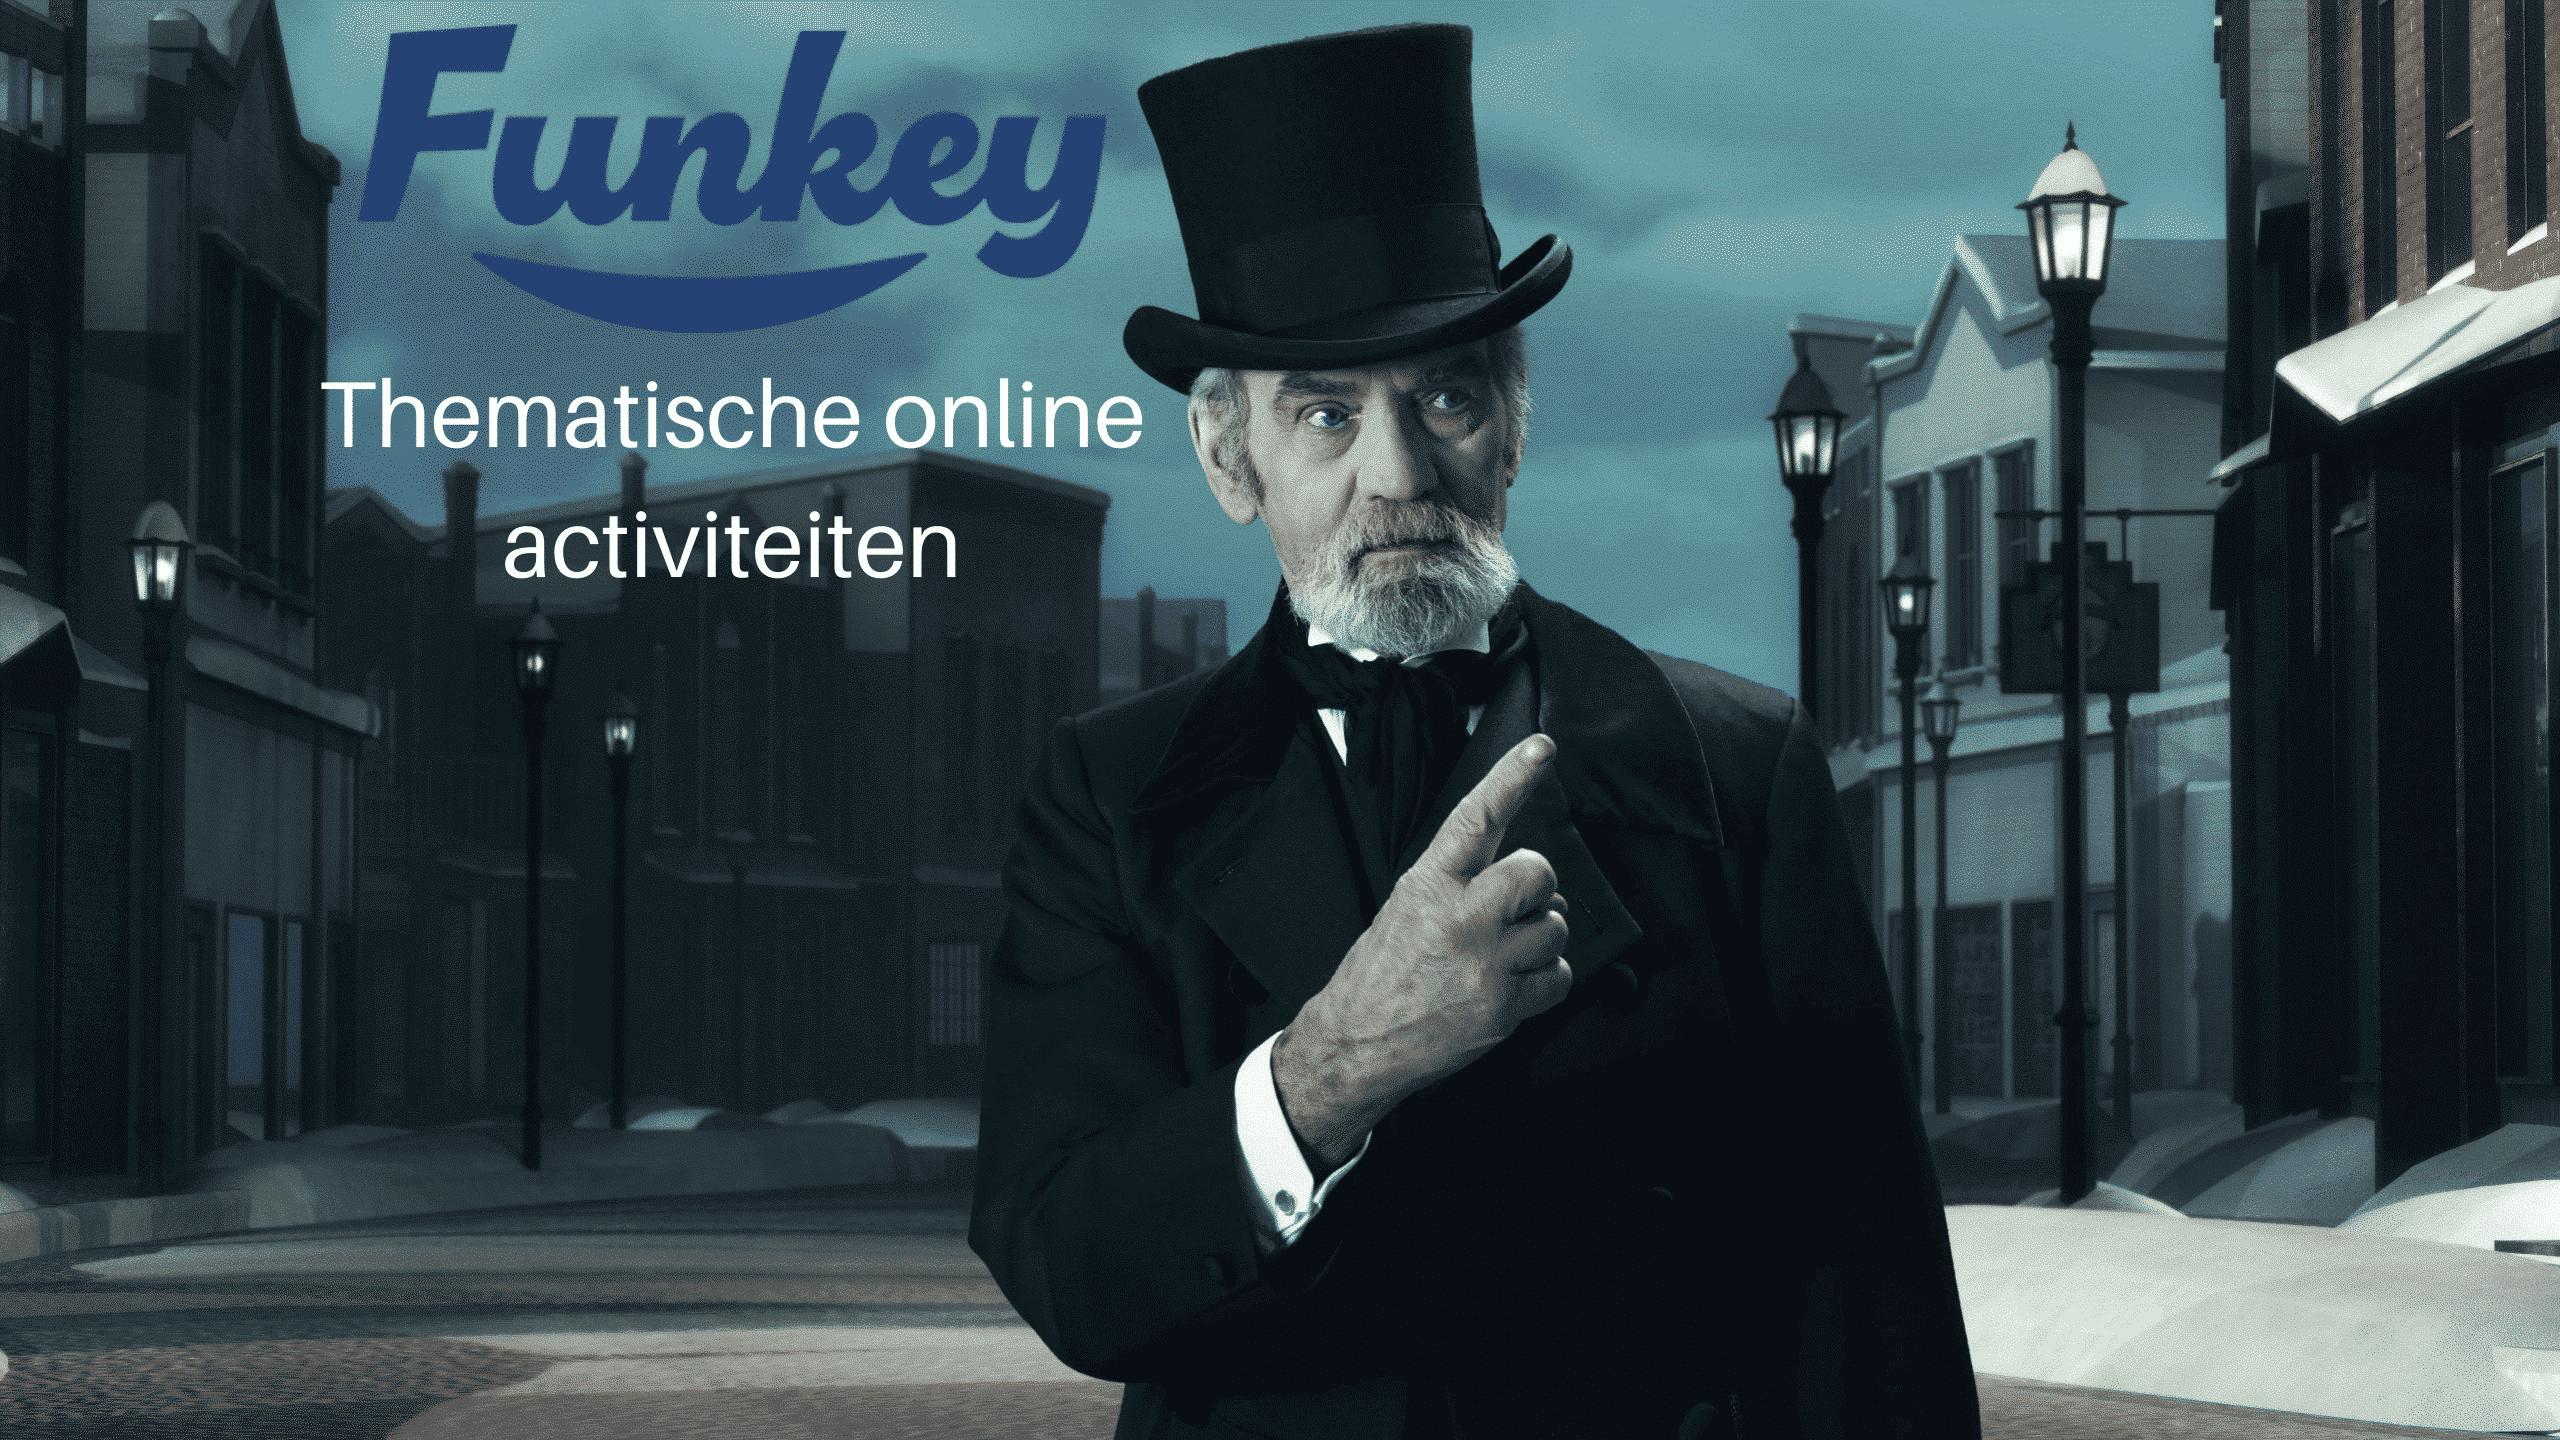 Thematische online activiteiten